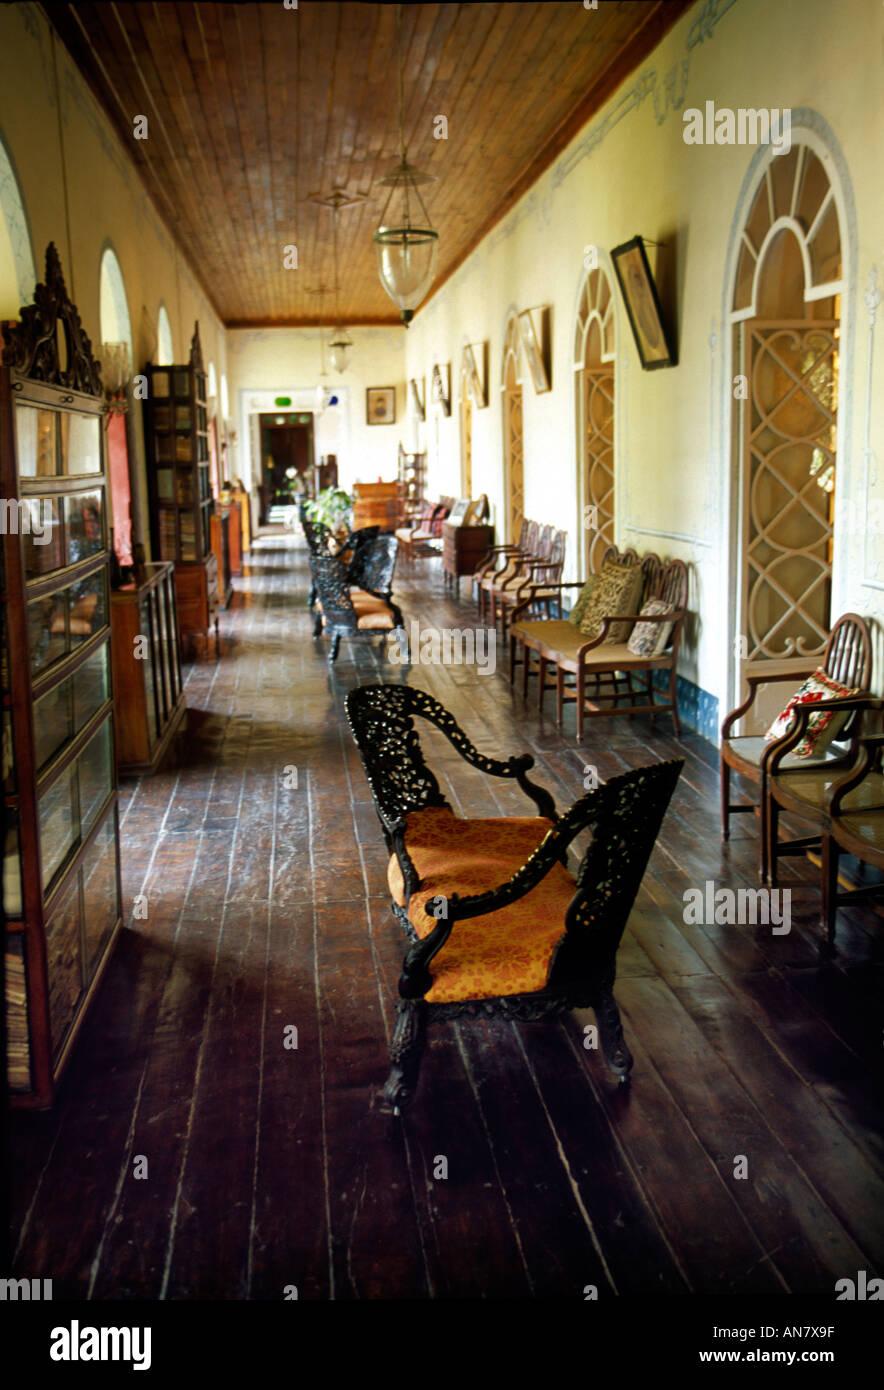 Goan Portuguese Heritage House Indoors Menezes Braganza House Chandor  Village, Goa India